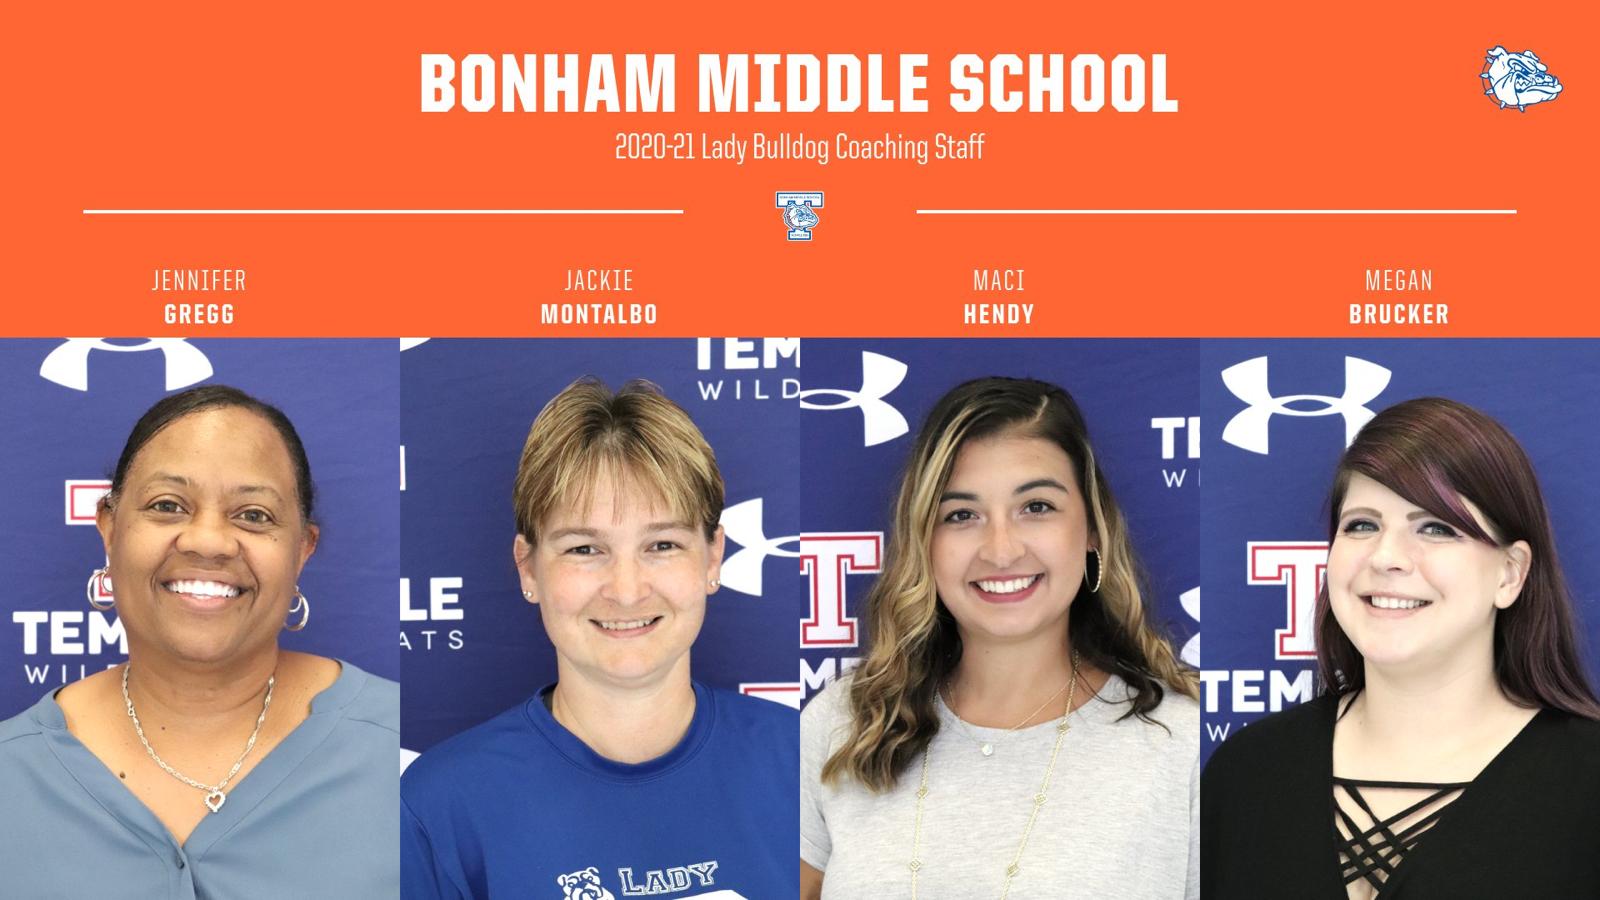 Bonham Middle School Girls Coaching Staff